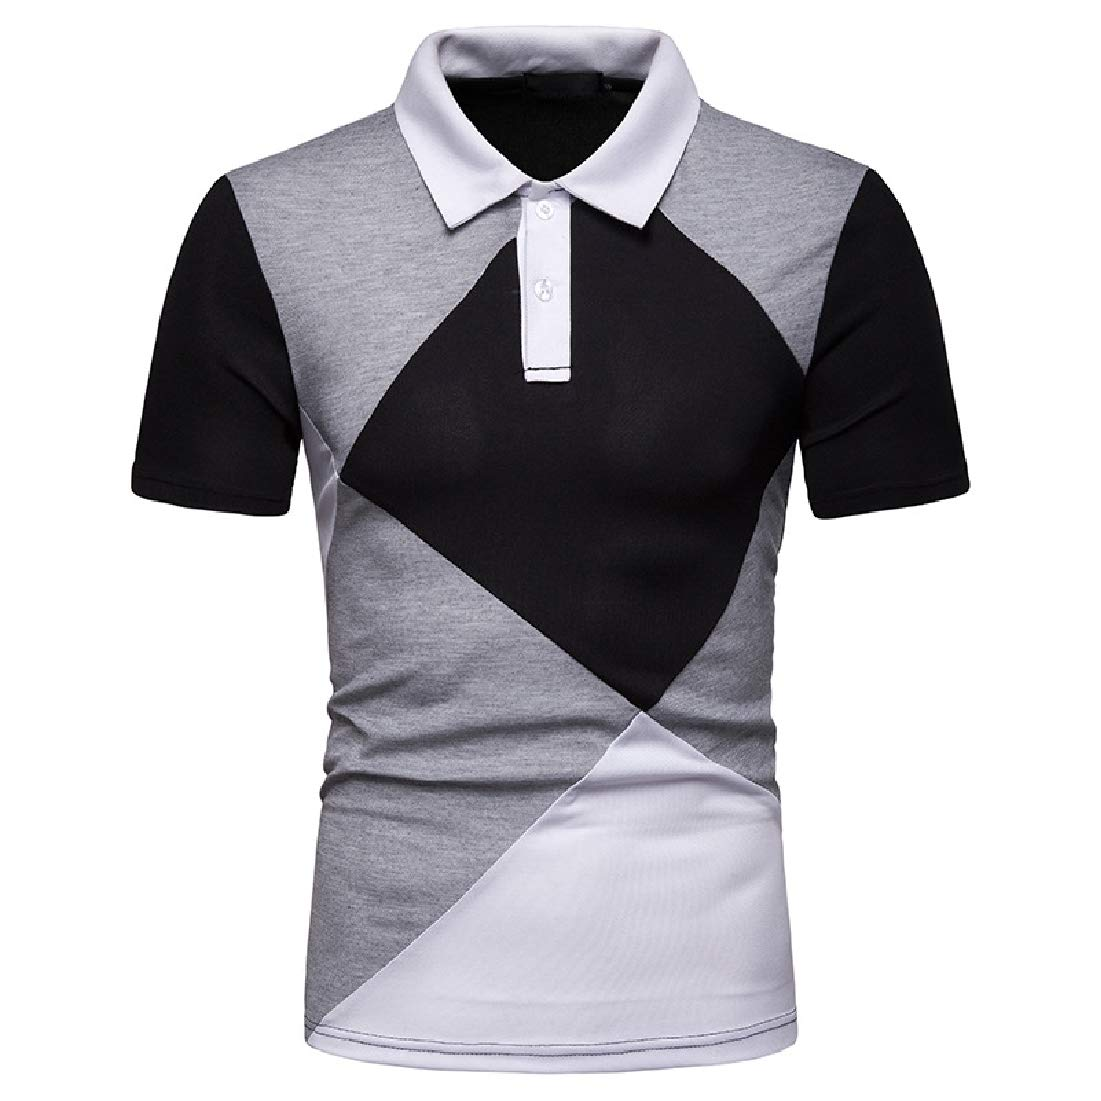 ed28f1aa Wholesale Nike Golf Shirts China - DREAMWORKS